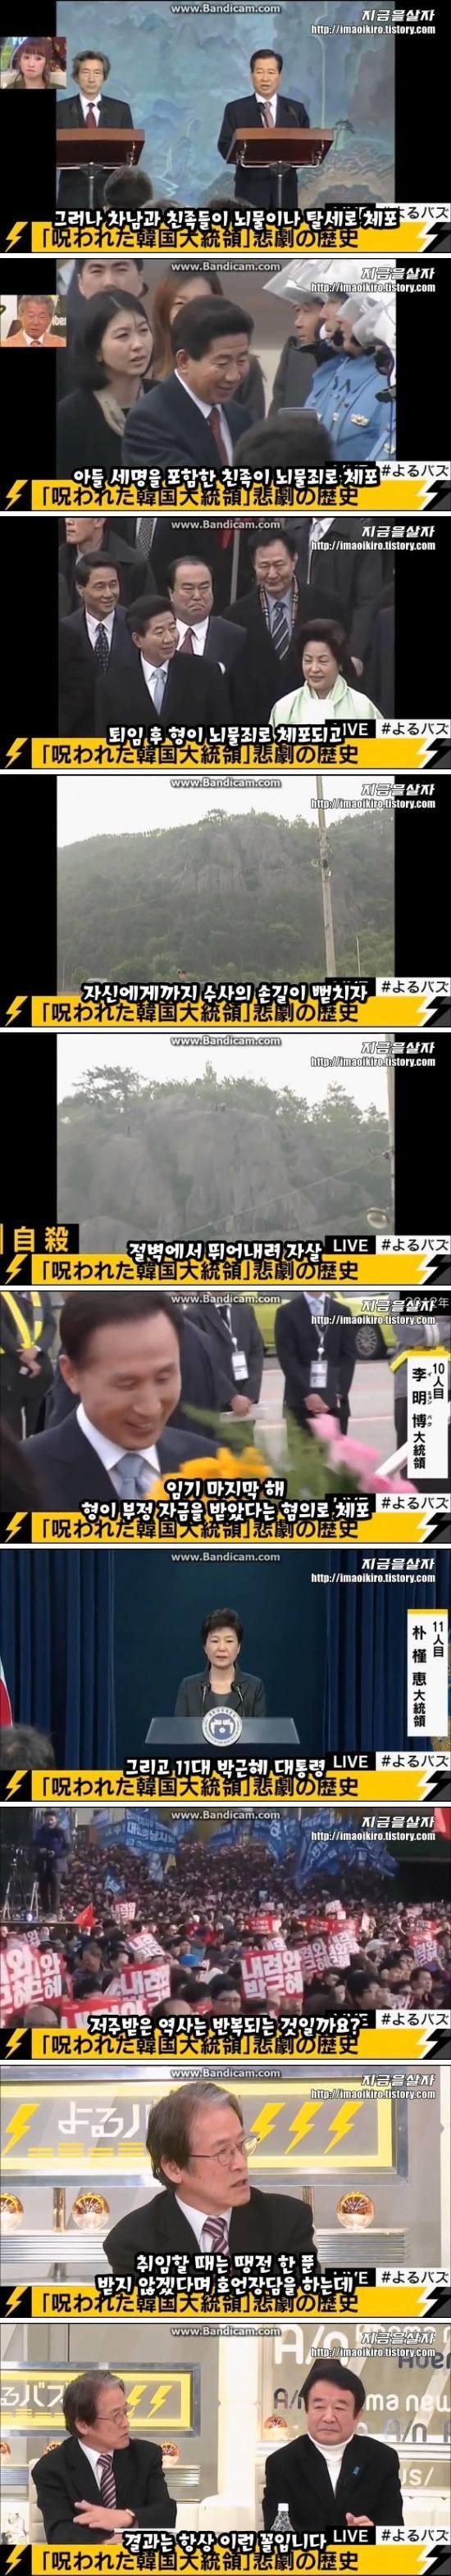 1a874b23097a08.jpg 일본방송 분석